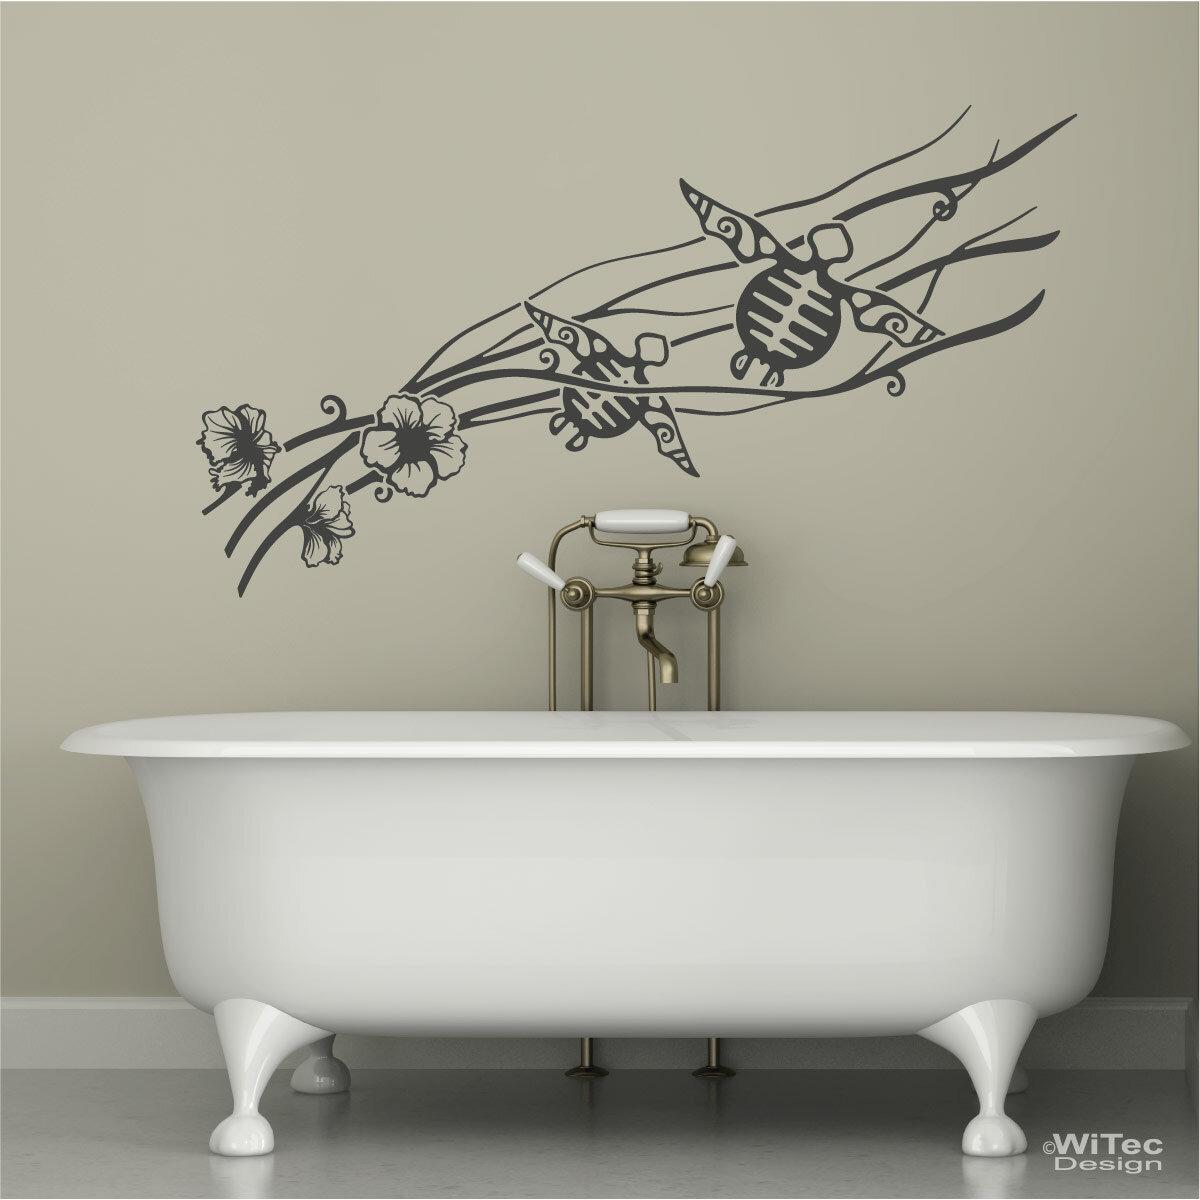 Hibiskus Schildkröten Wandtattoo Badezimmer